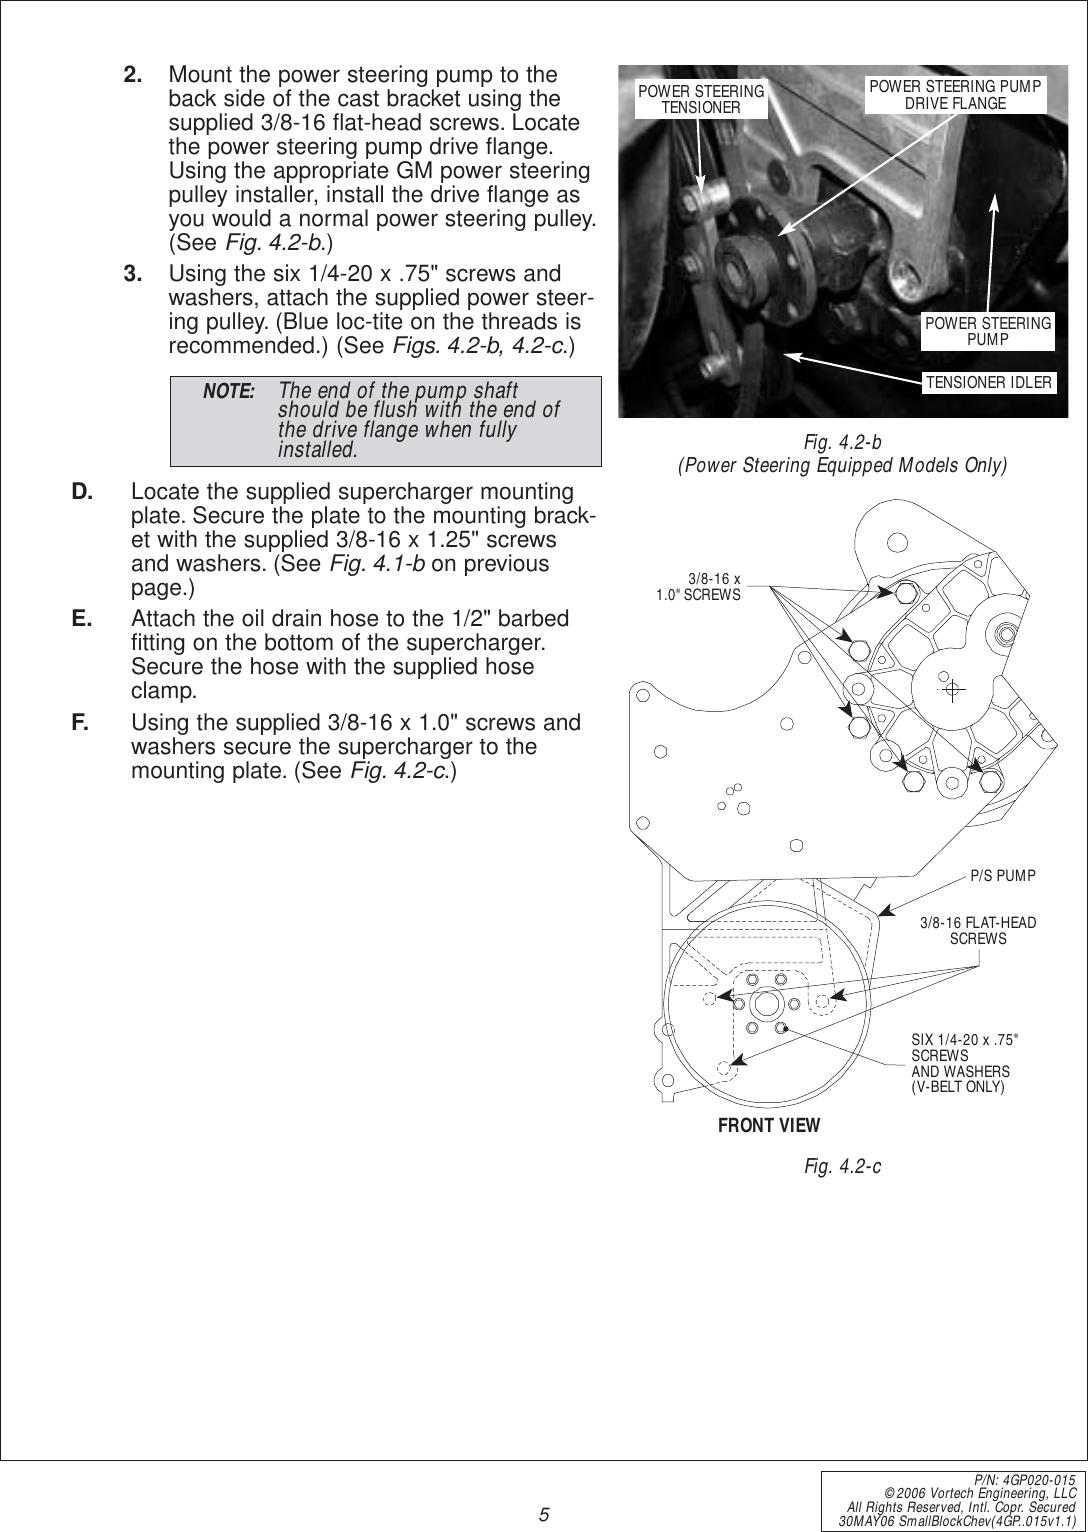 Vortech Engineering 4Gp020 01 Users Manual (4GP  015v1 1)SBC